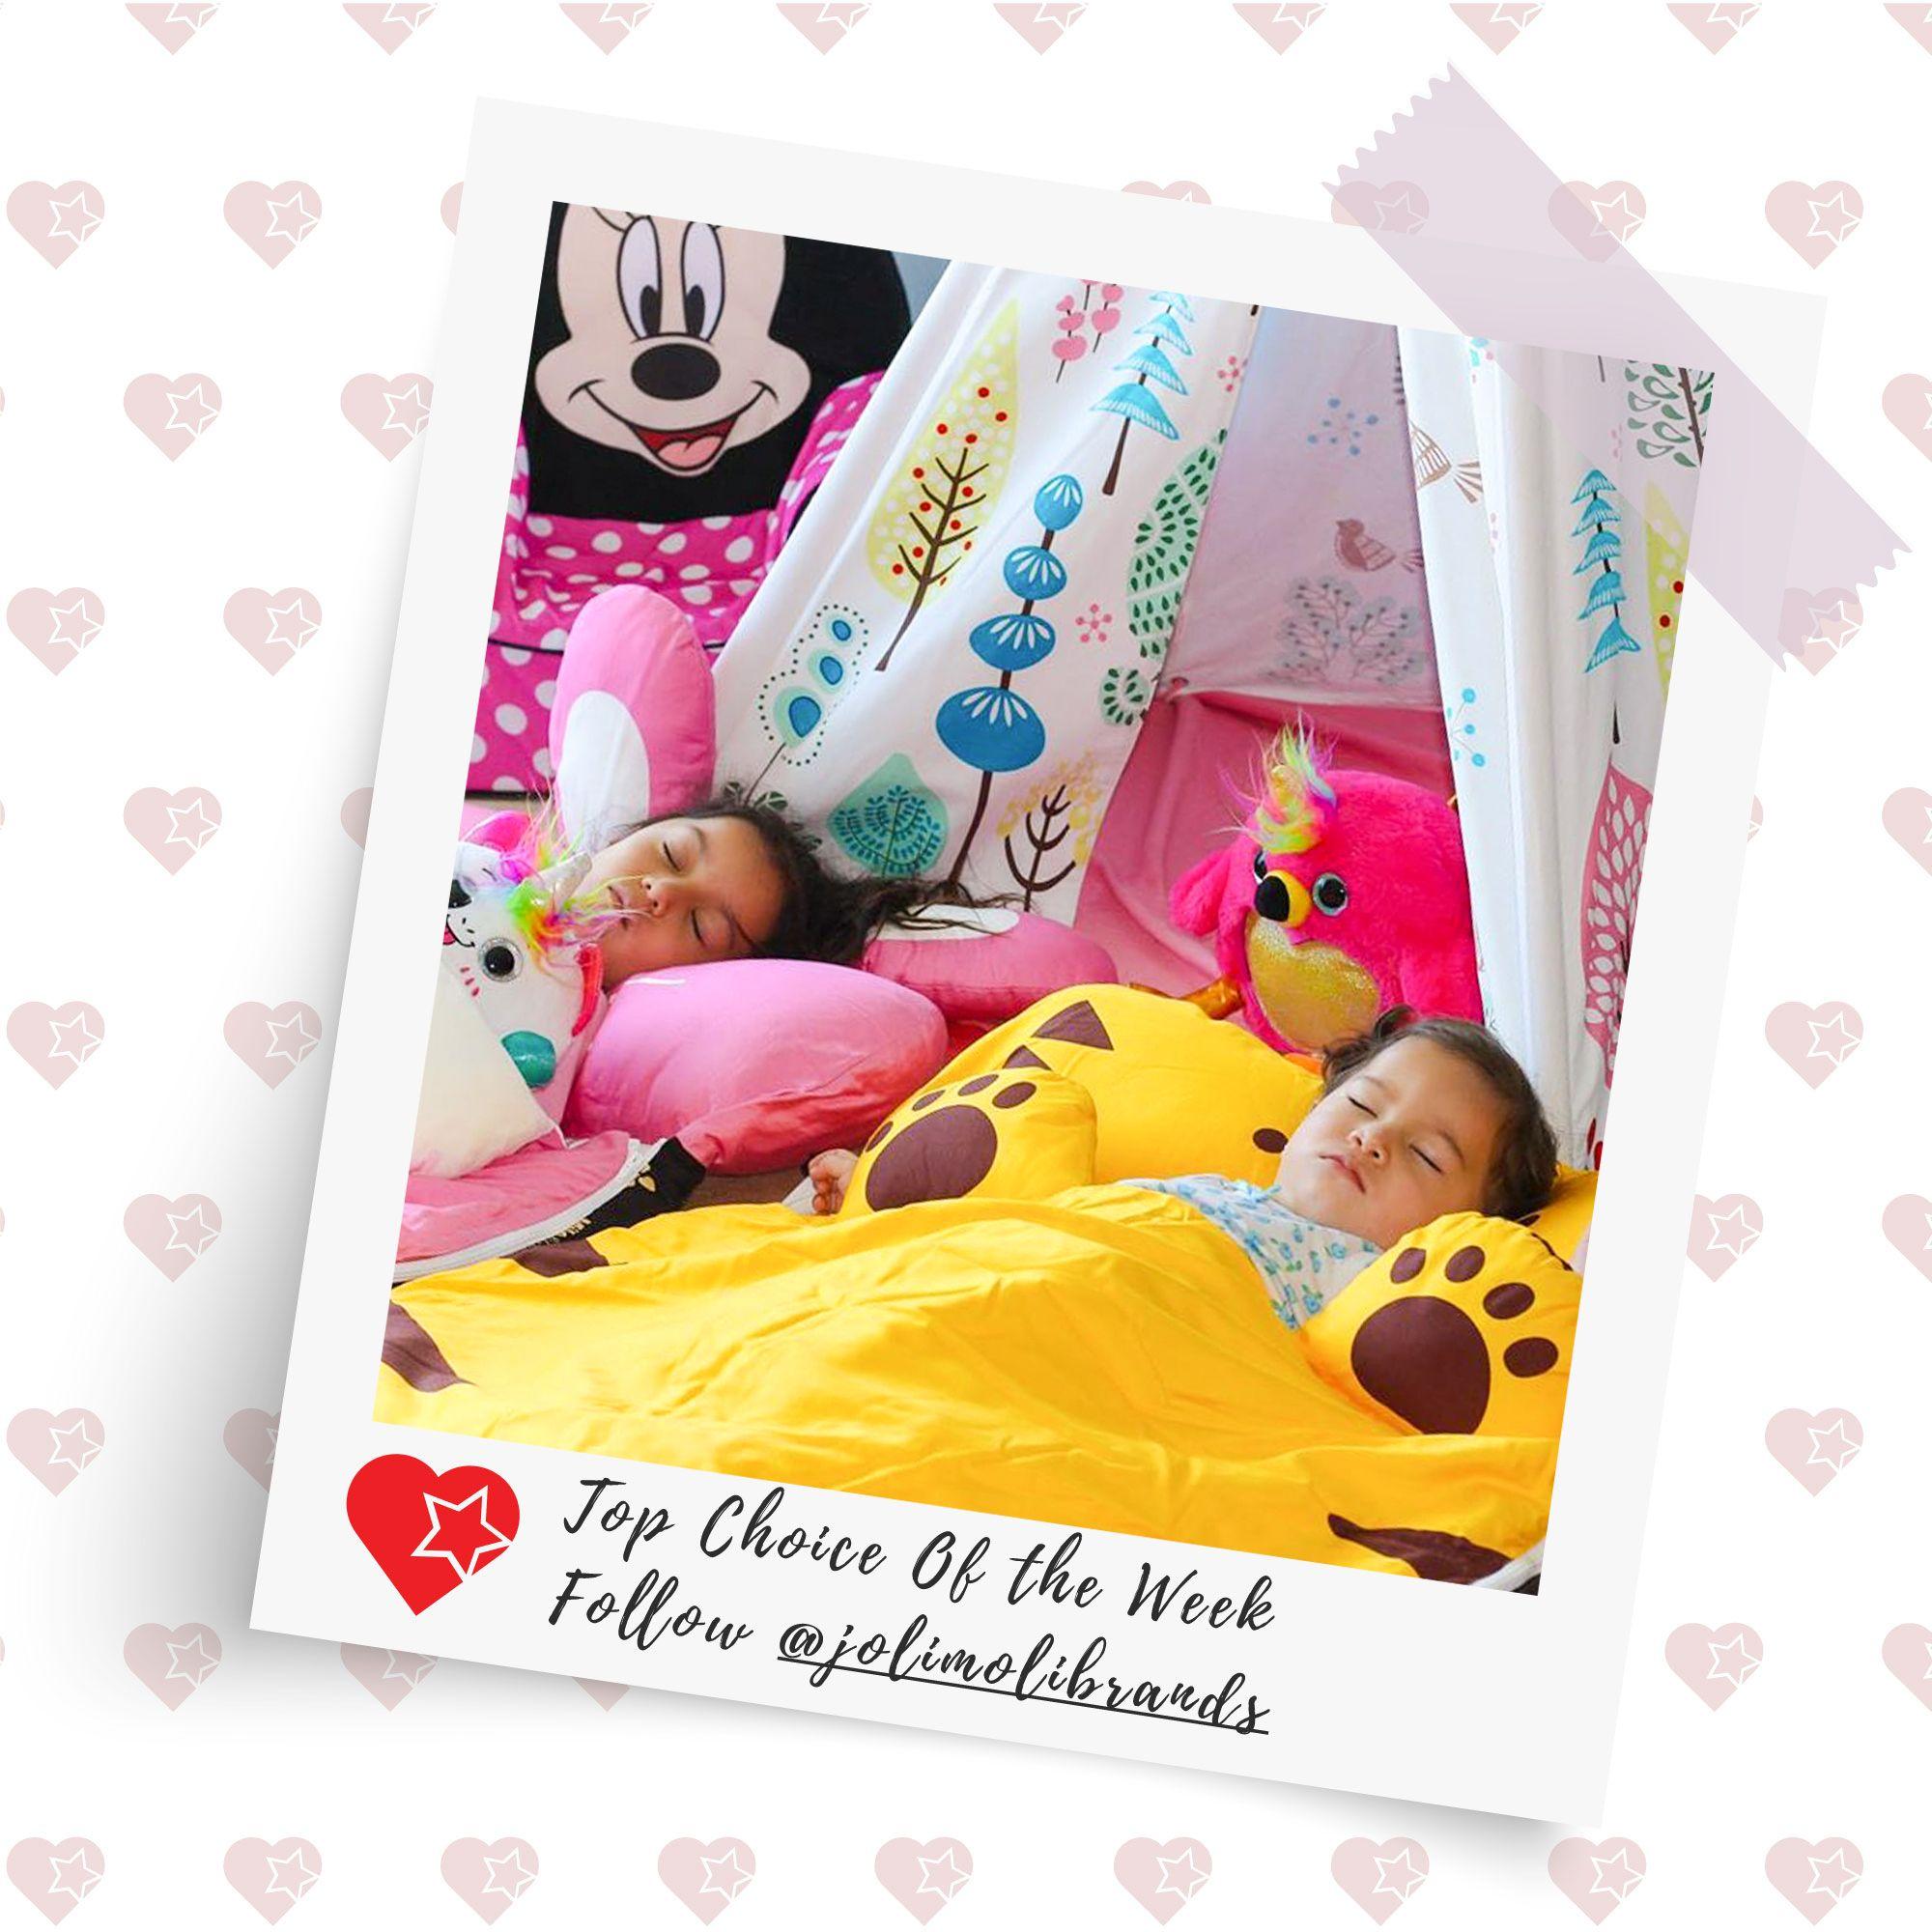 Sleep tight, little ones! Our naptime mats are dreamy soft and cuddly cute! 😴      #sunday #nap #sleepingbag #bunny #milloandgabby #kids #instagram_kids  #nurserydecor #baby #kidsroom #nurseryinspo #kidsdecor #babygirl #homedecor #babyroom #kidsinterior #bedroom #myfirstphotoshoot #sleep #babyhammock #babylove